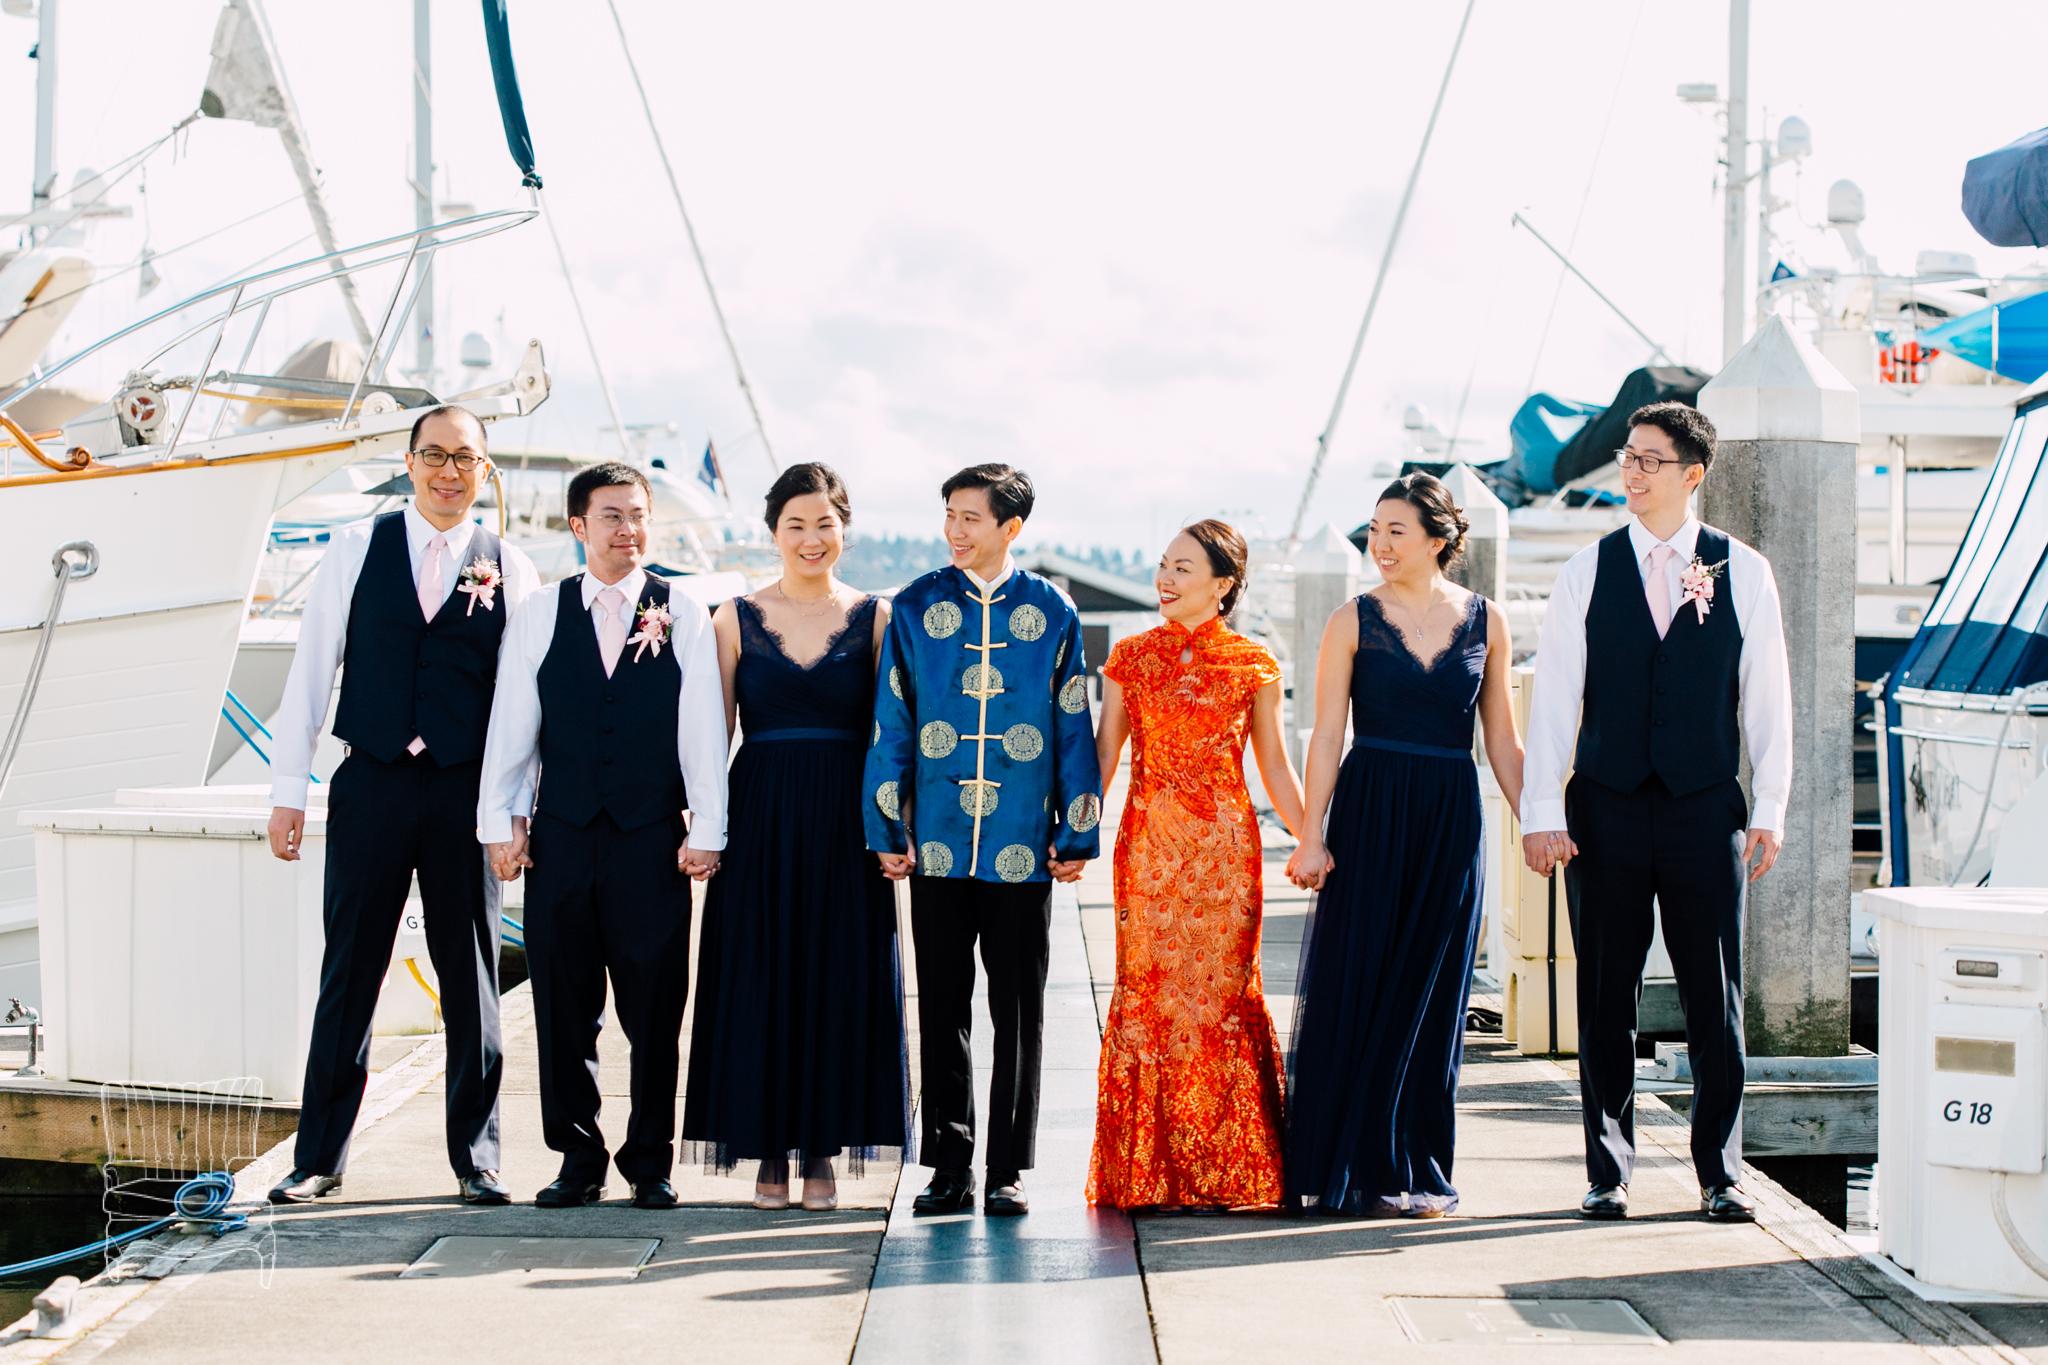 seattle-kerry-park-wedding-katheryn-moran-photography-yovithomas-1-6.JPG